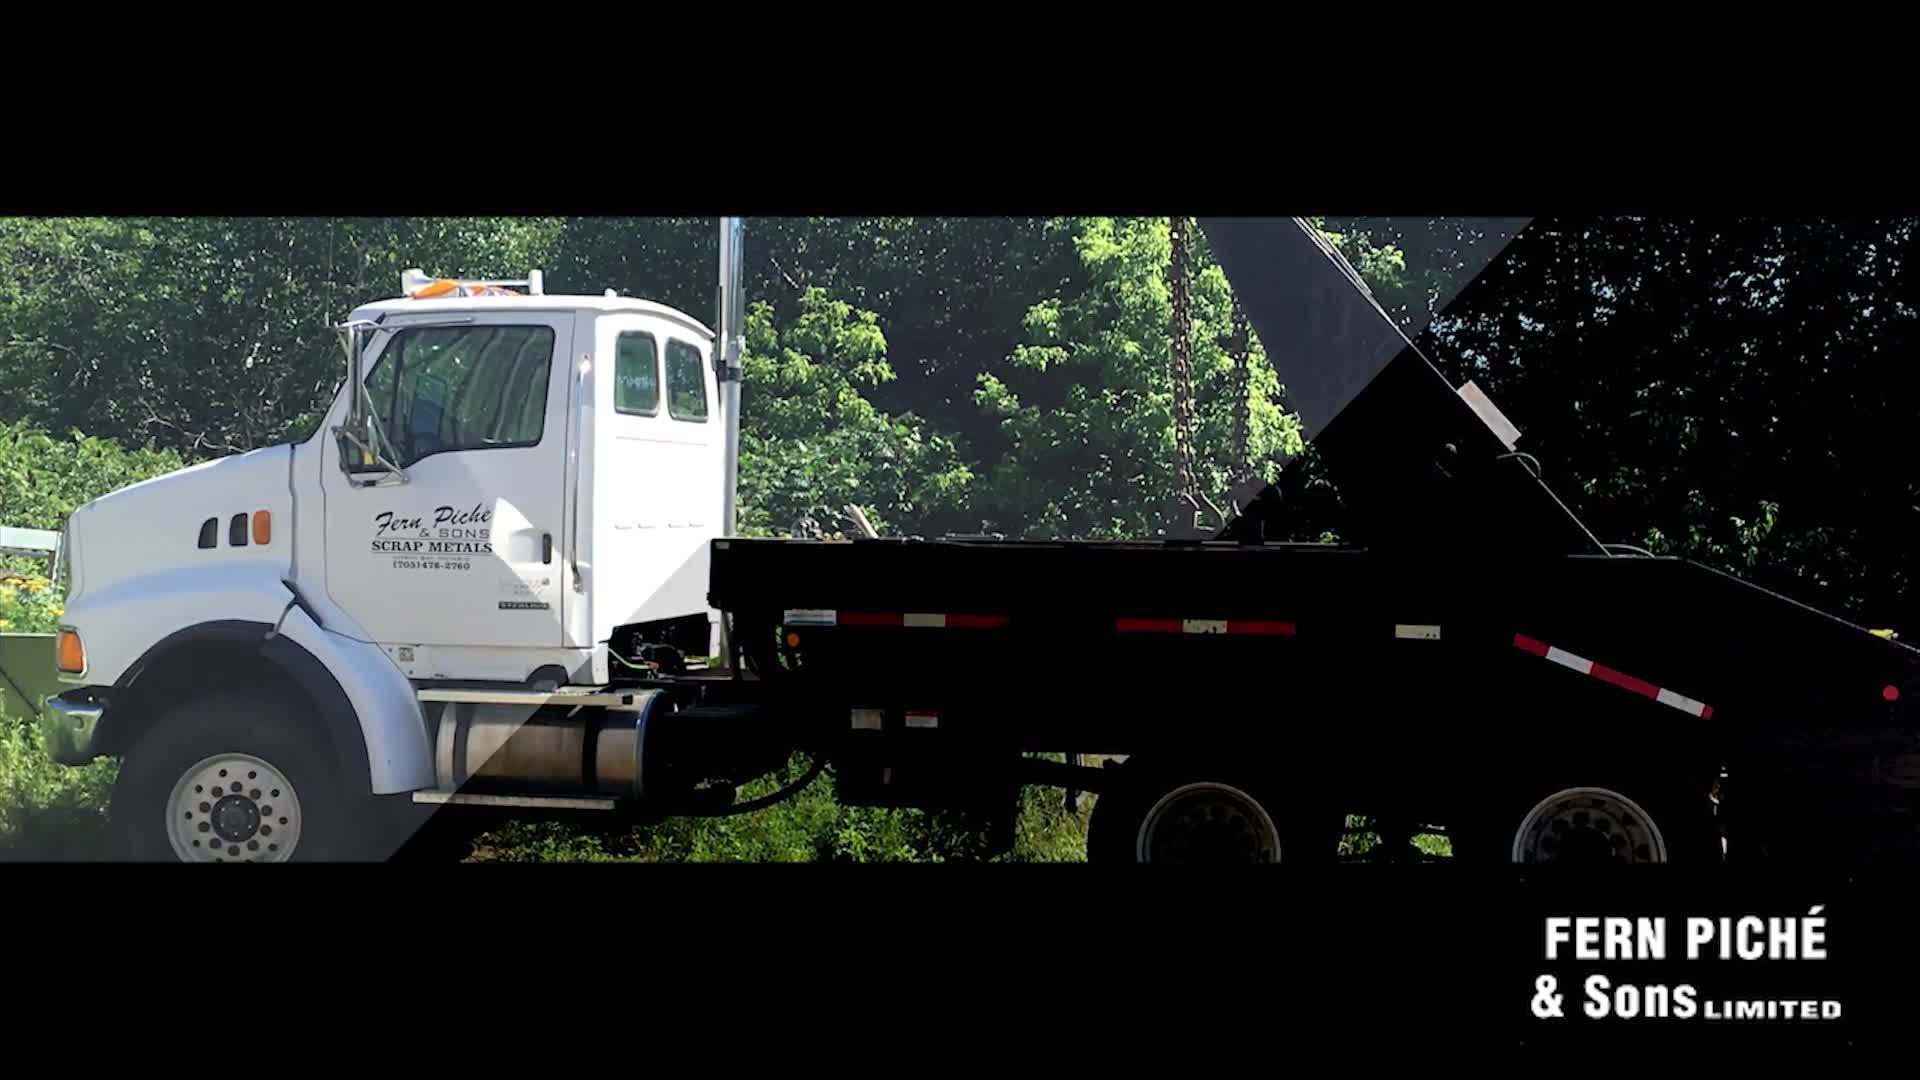 Piche Fern & Sons Limited - Scrap Metals - 705-476-2760